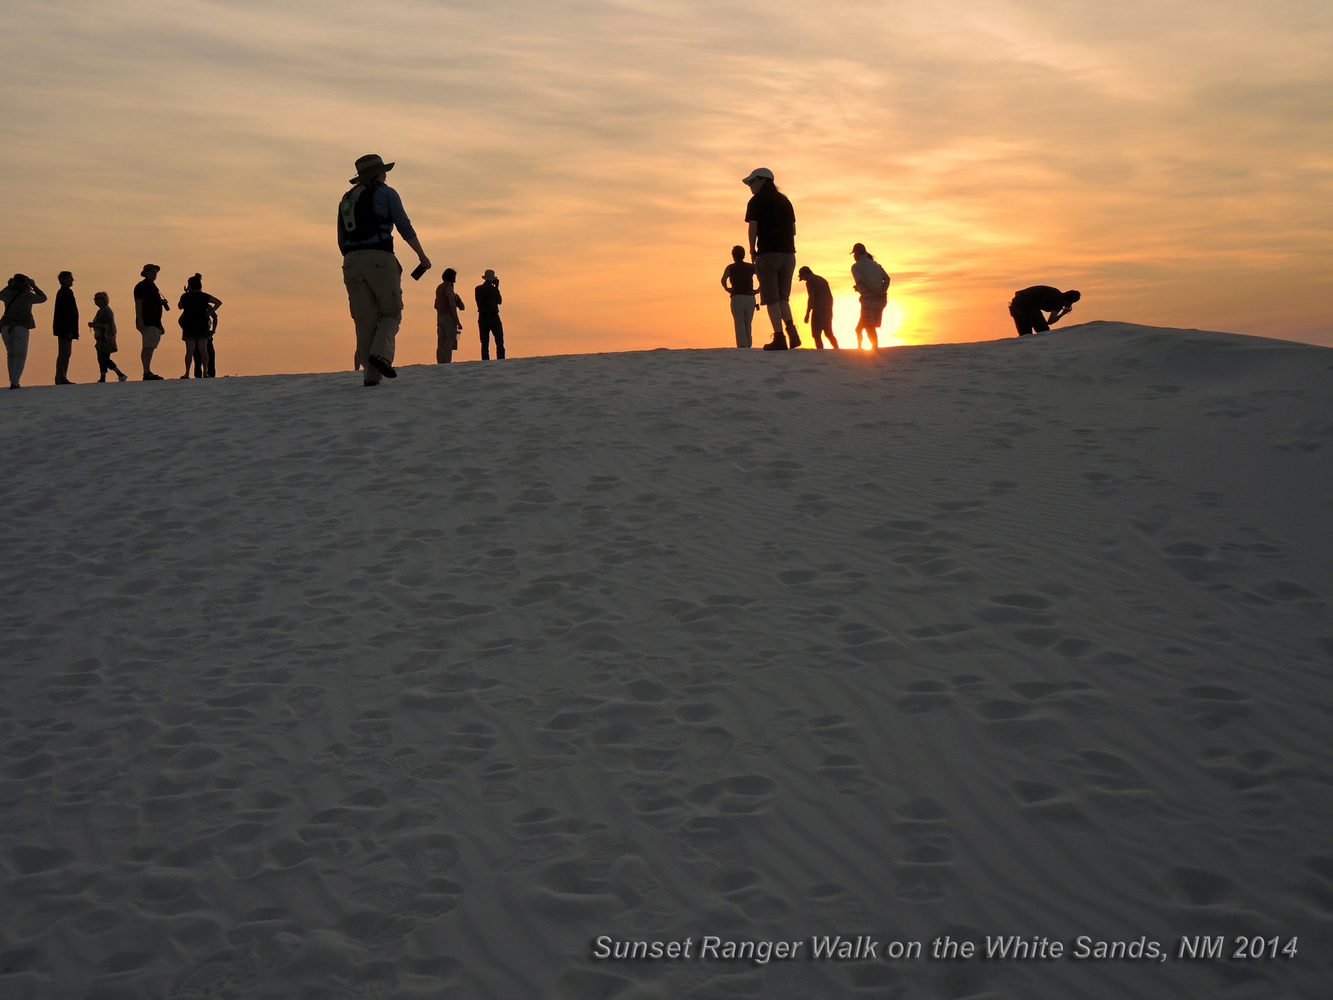 Sunset Ranger Walk, White Sands, New Mexico by Charles Haacker